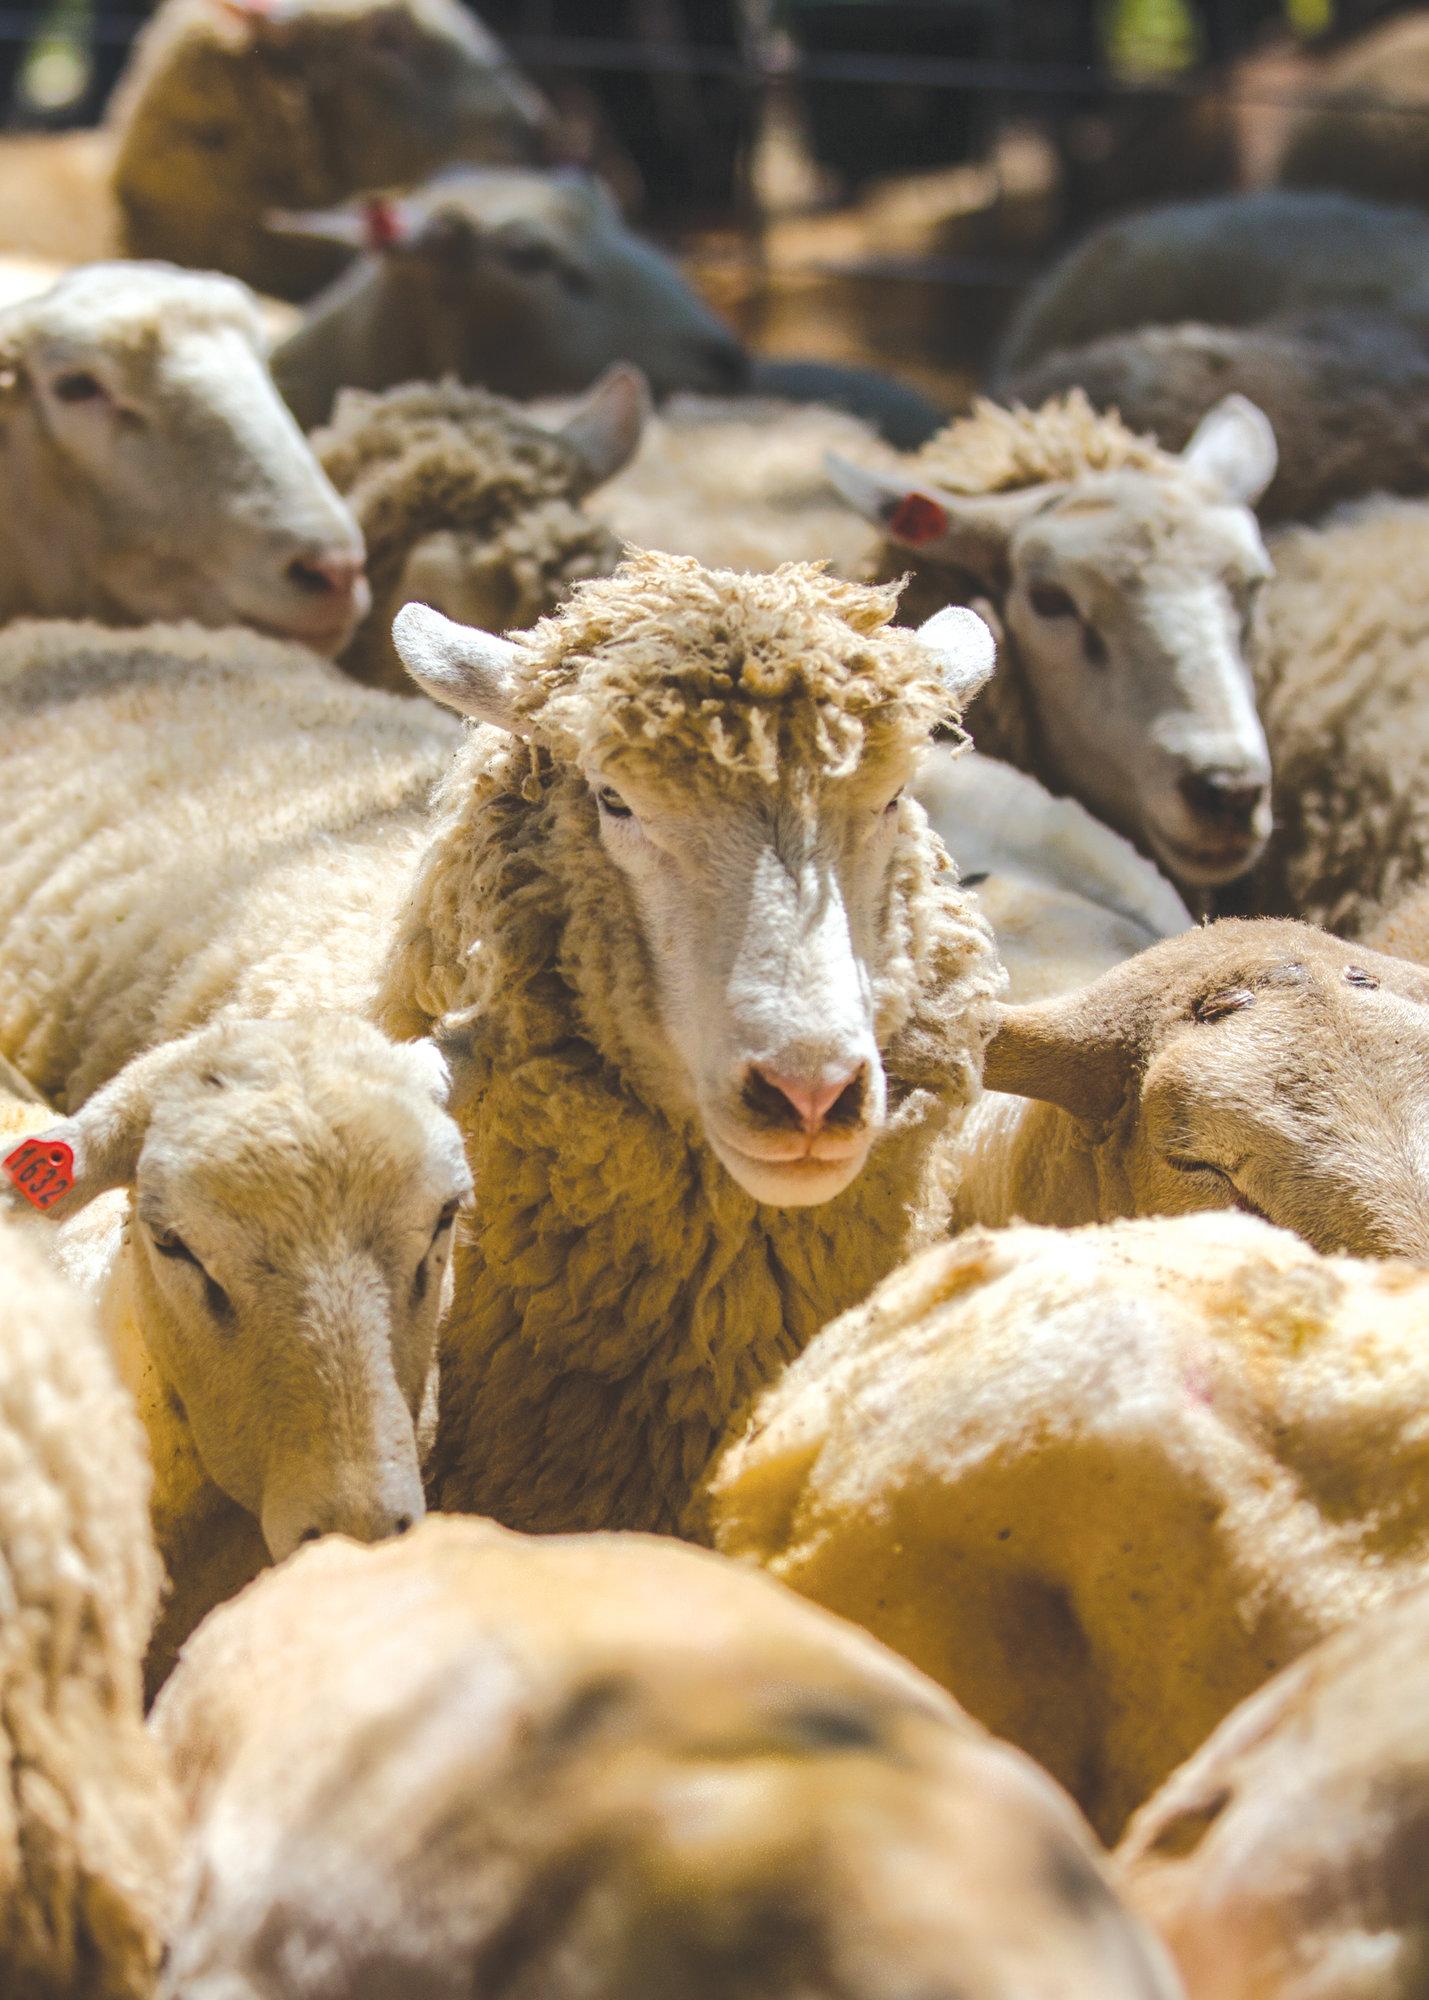 Enjoy daily farm life at Sheep Shearing Farm Day at Old McCaskill's Farm in Rembert | The Sumter Item